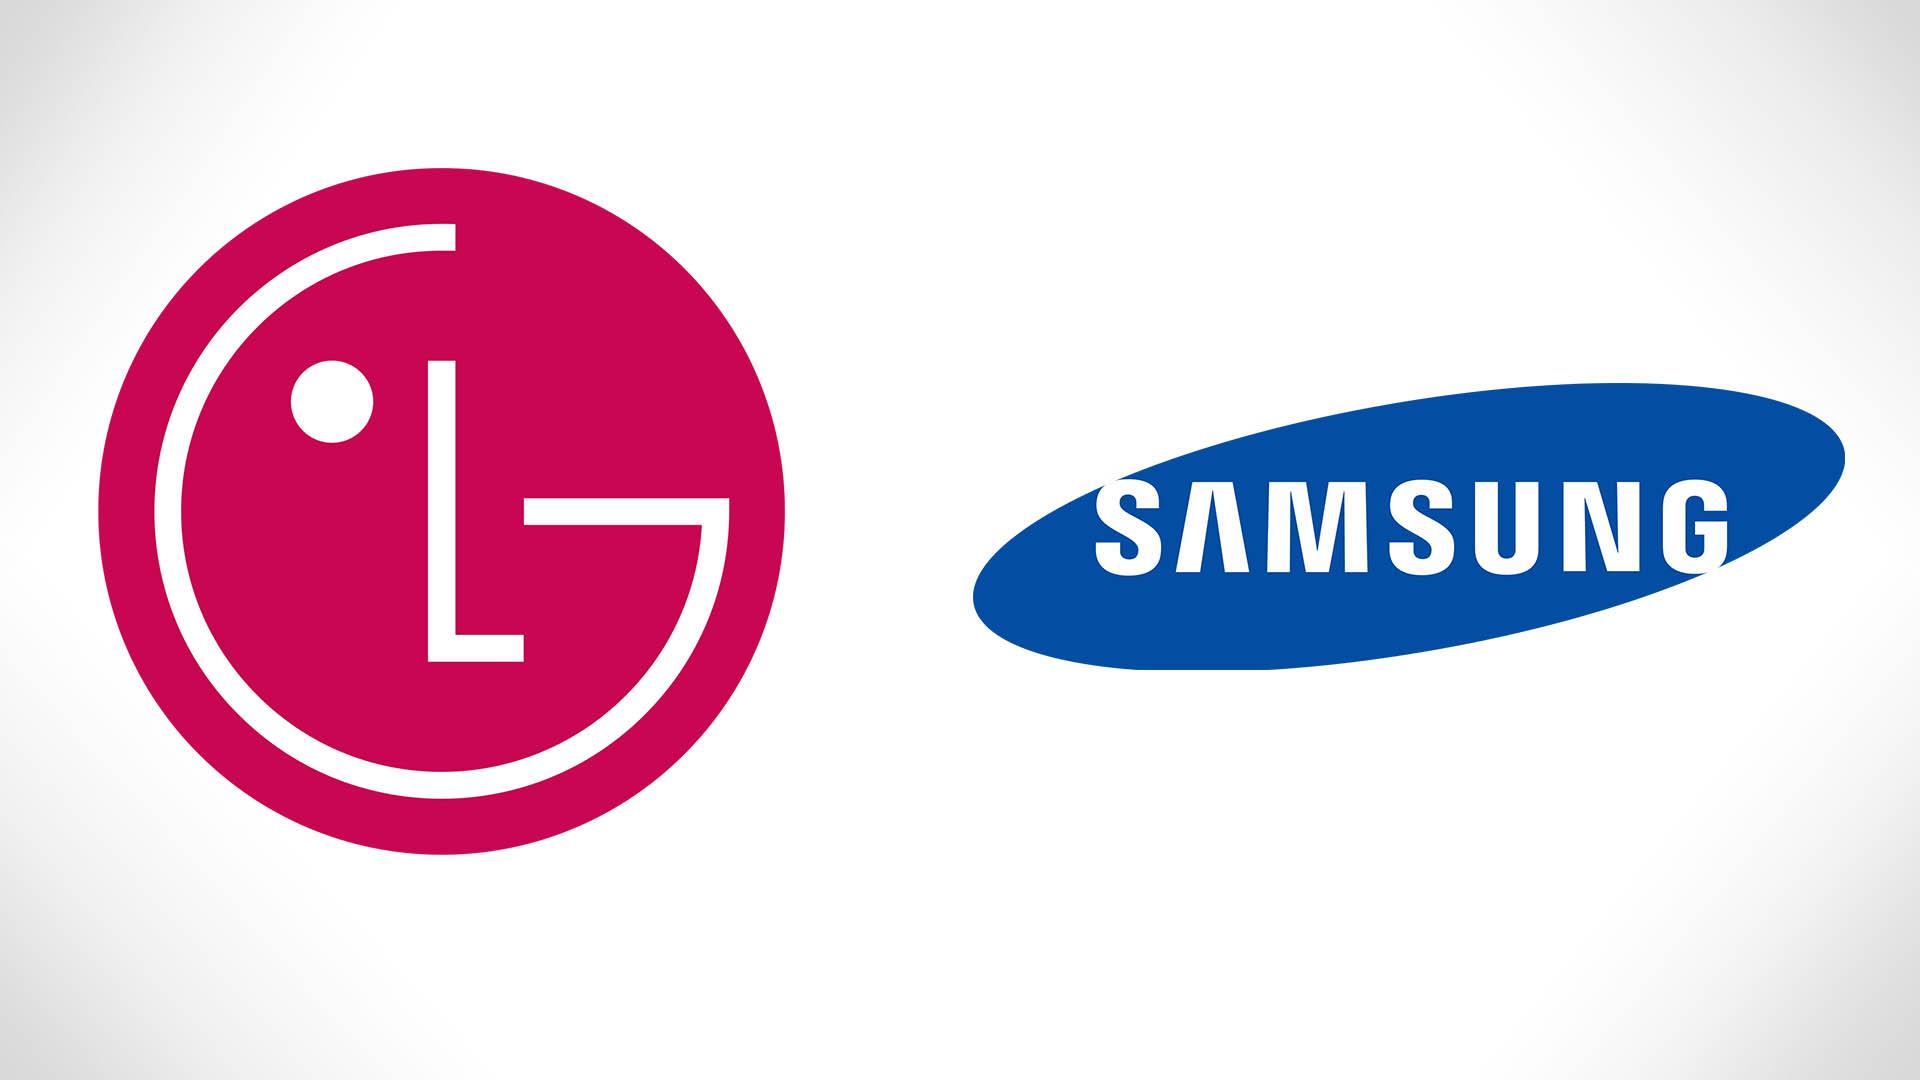 LG and Samsung Both Estimate Record-Breaking Profit Runs ...